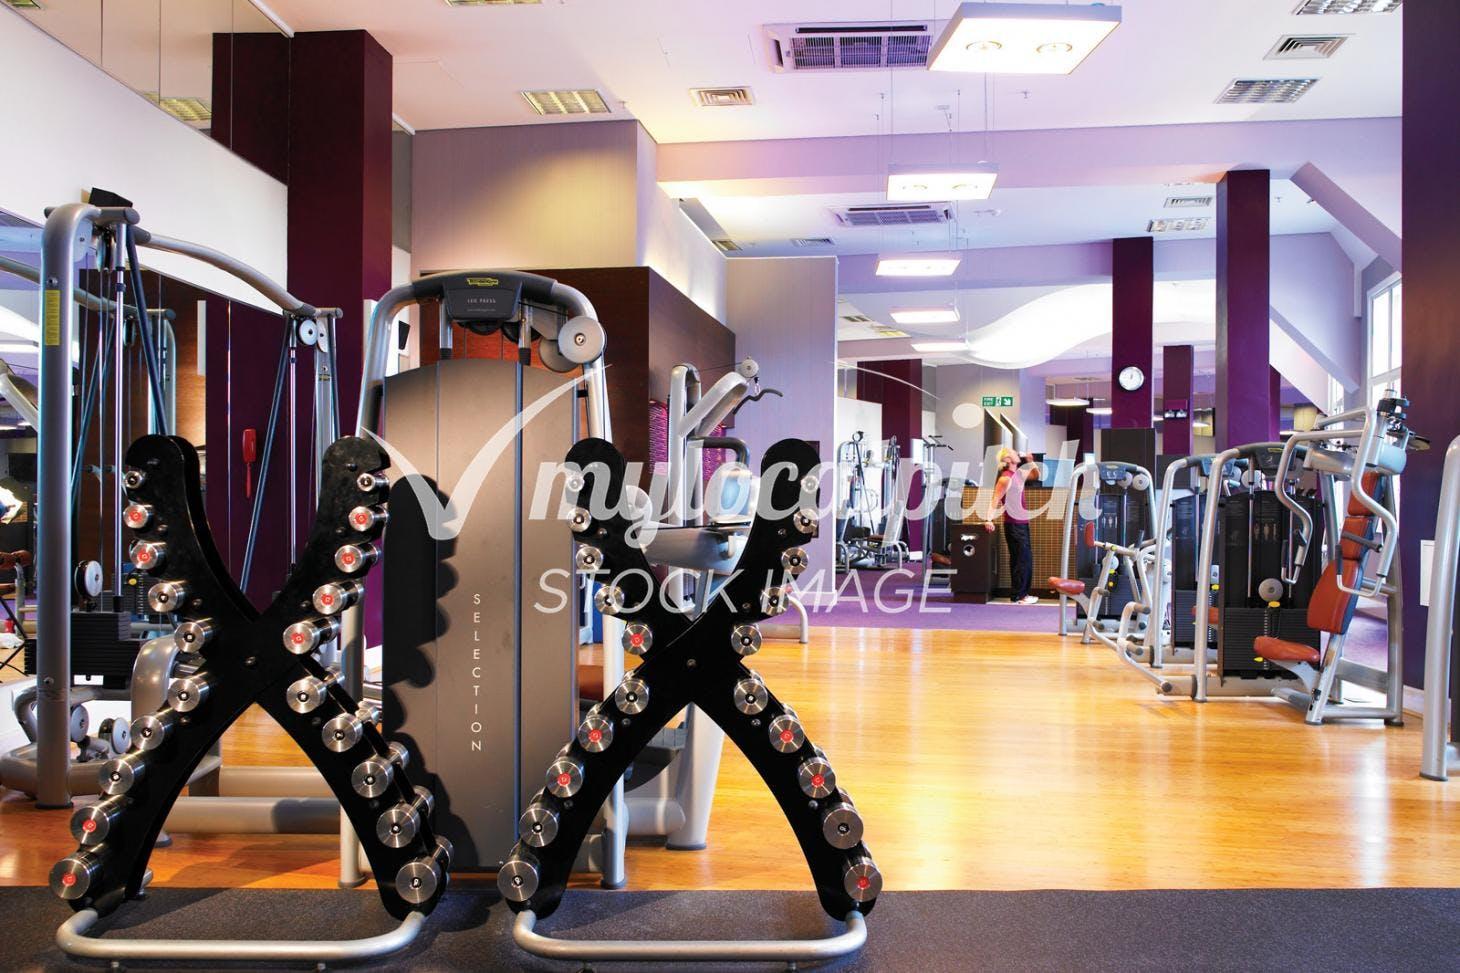 LA Fitness Edgware Gym gym